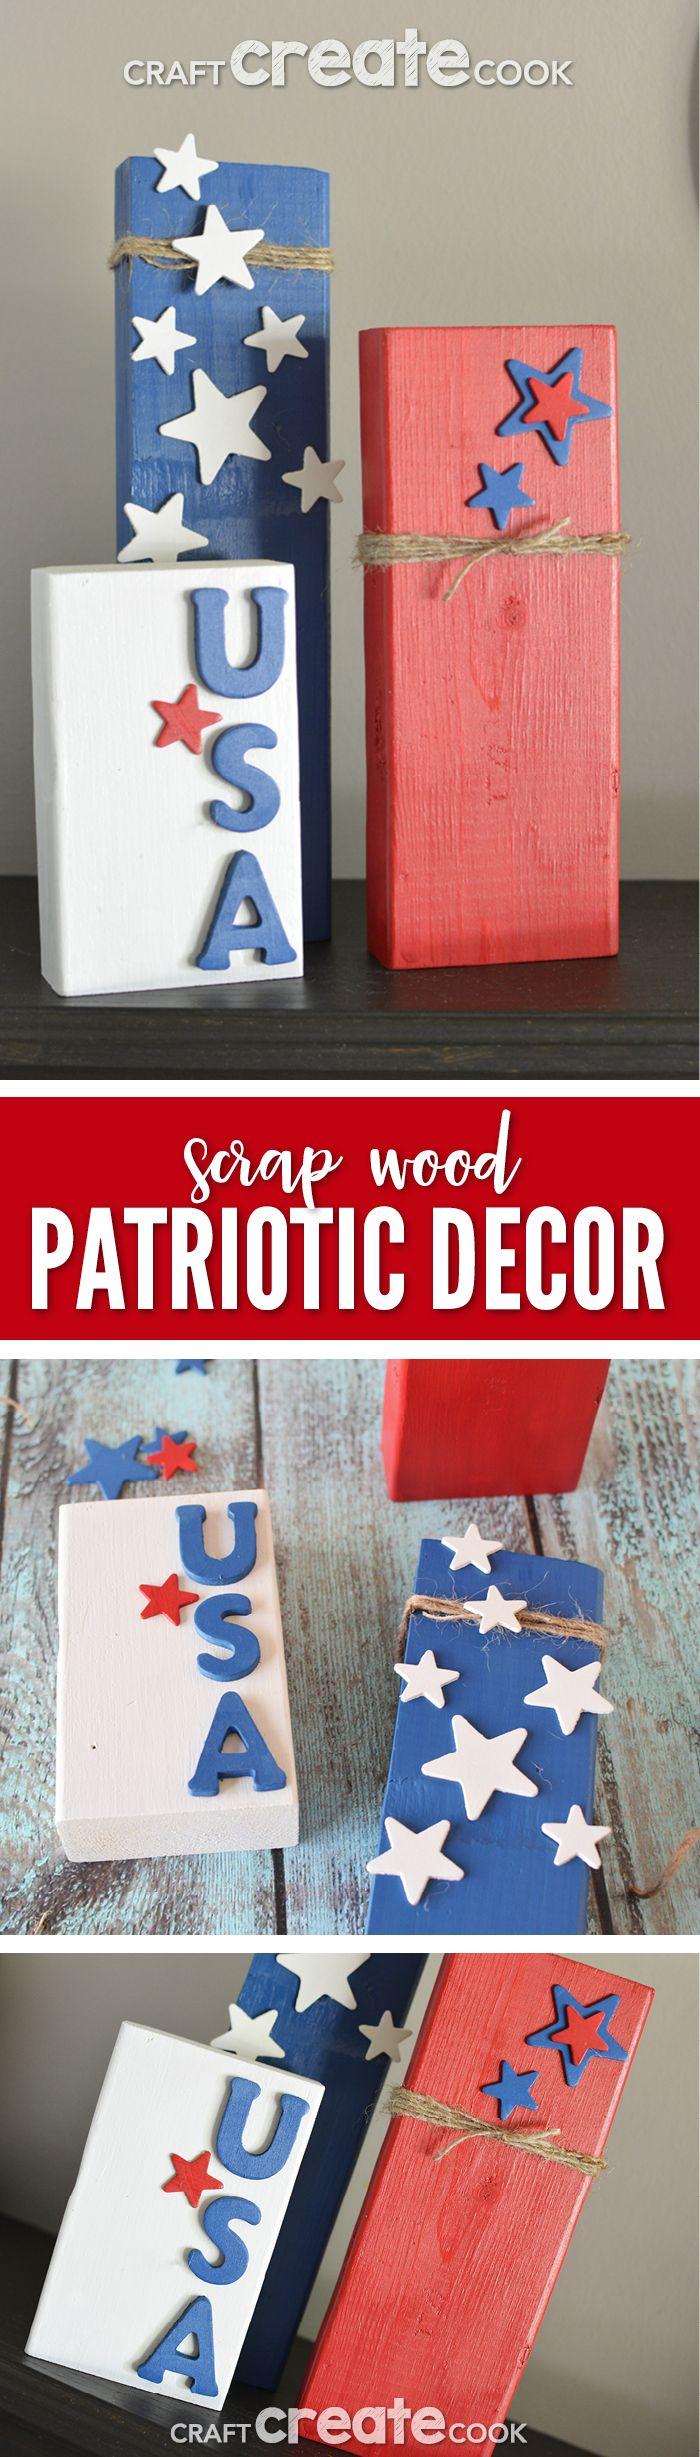 Patriotic Decorations Part - 46: Patriotic Decorations To Make With Scrap Wood